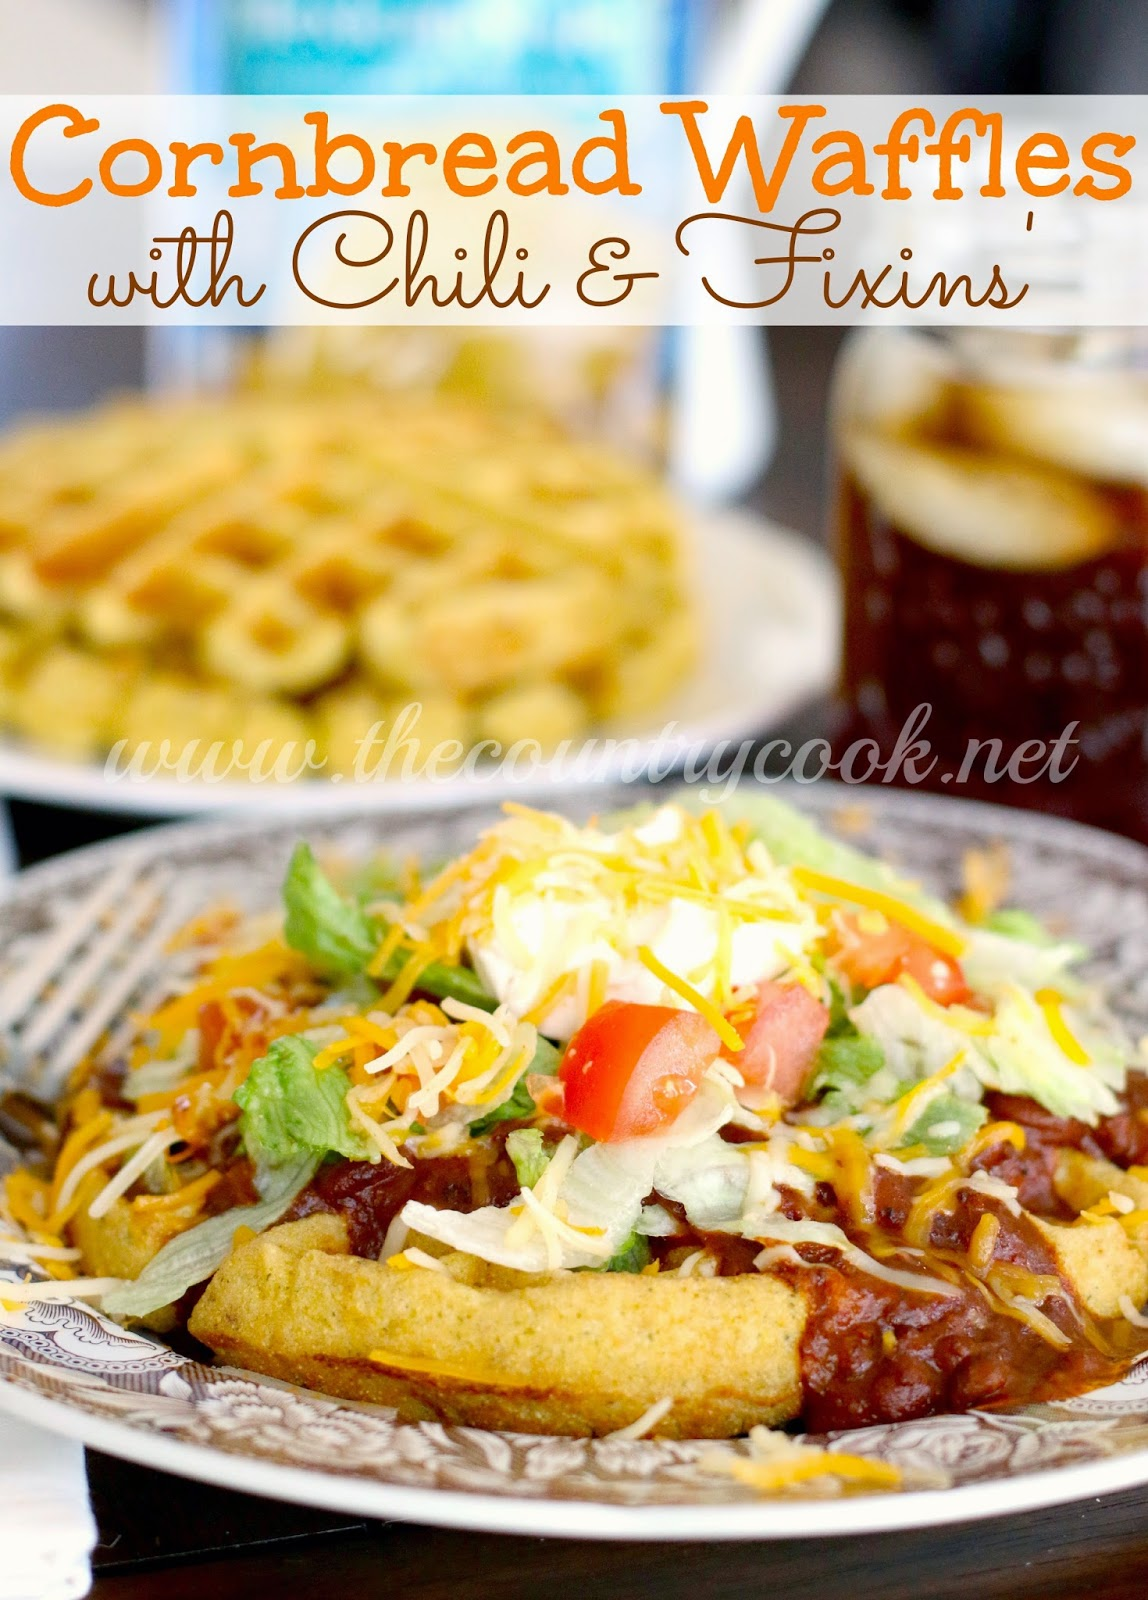 Cornbread Waffles (copyright, thecountrycook.net)